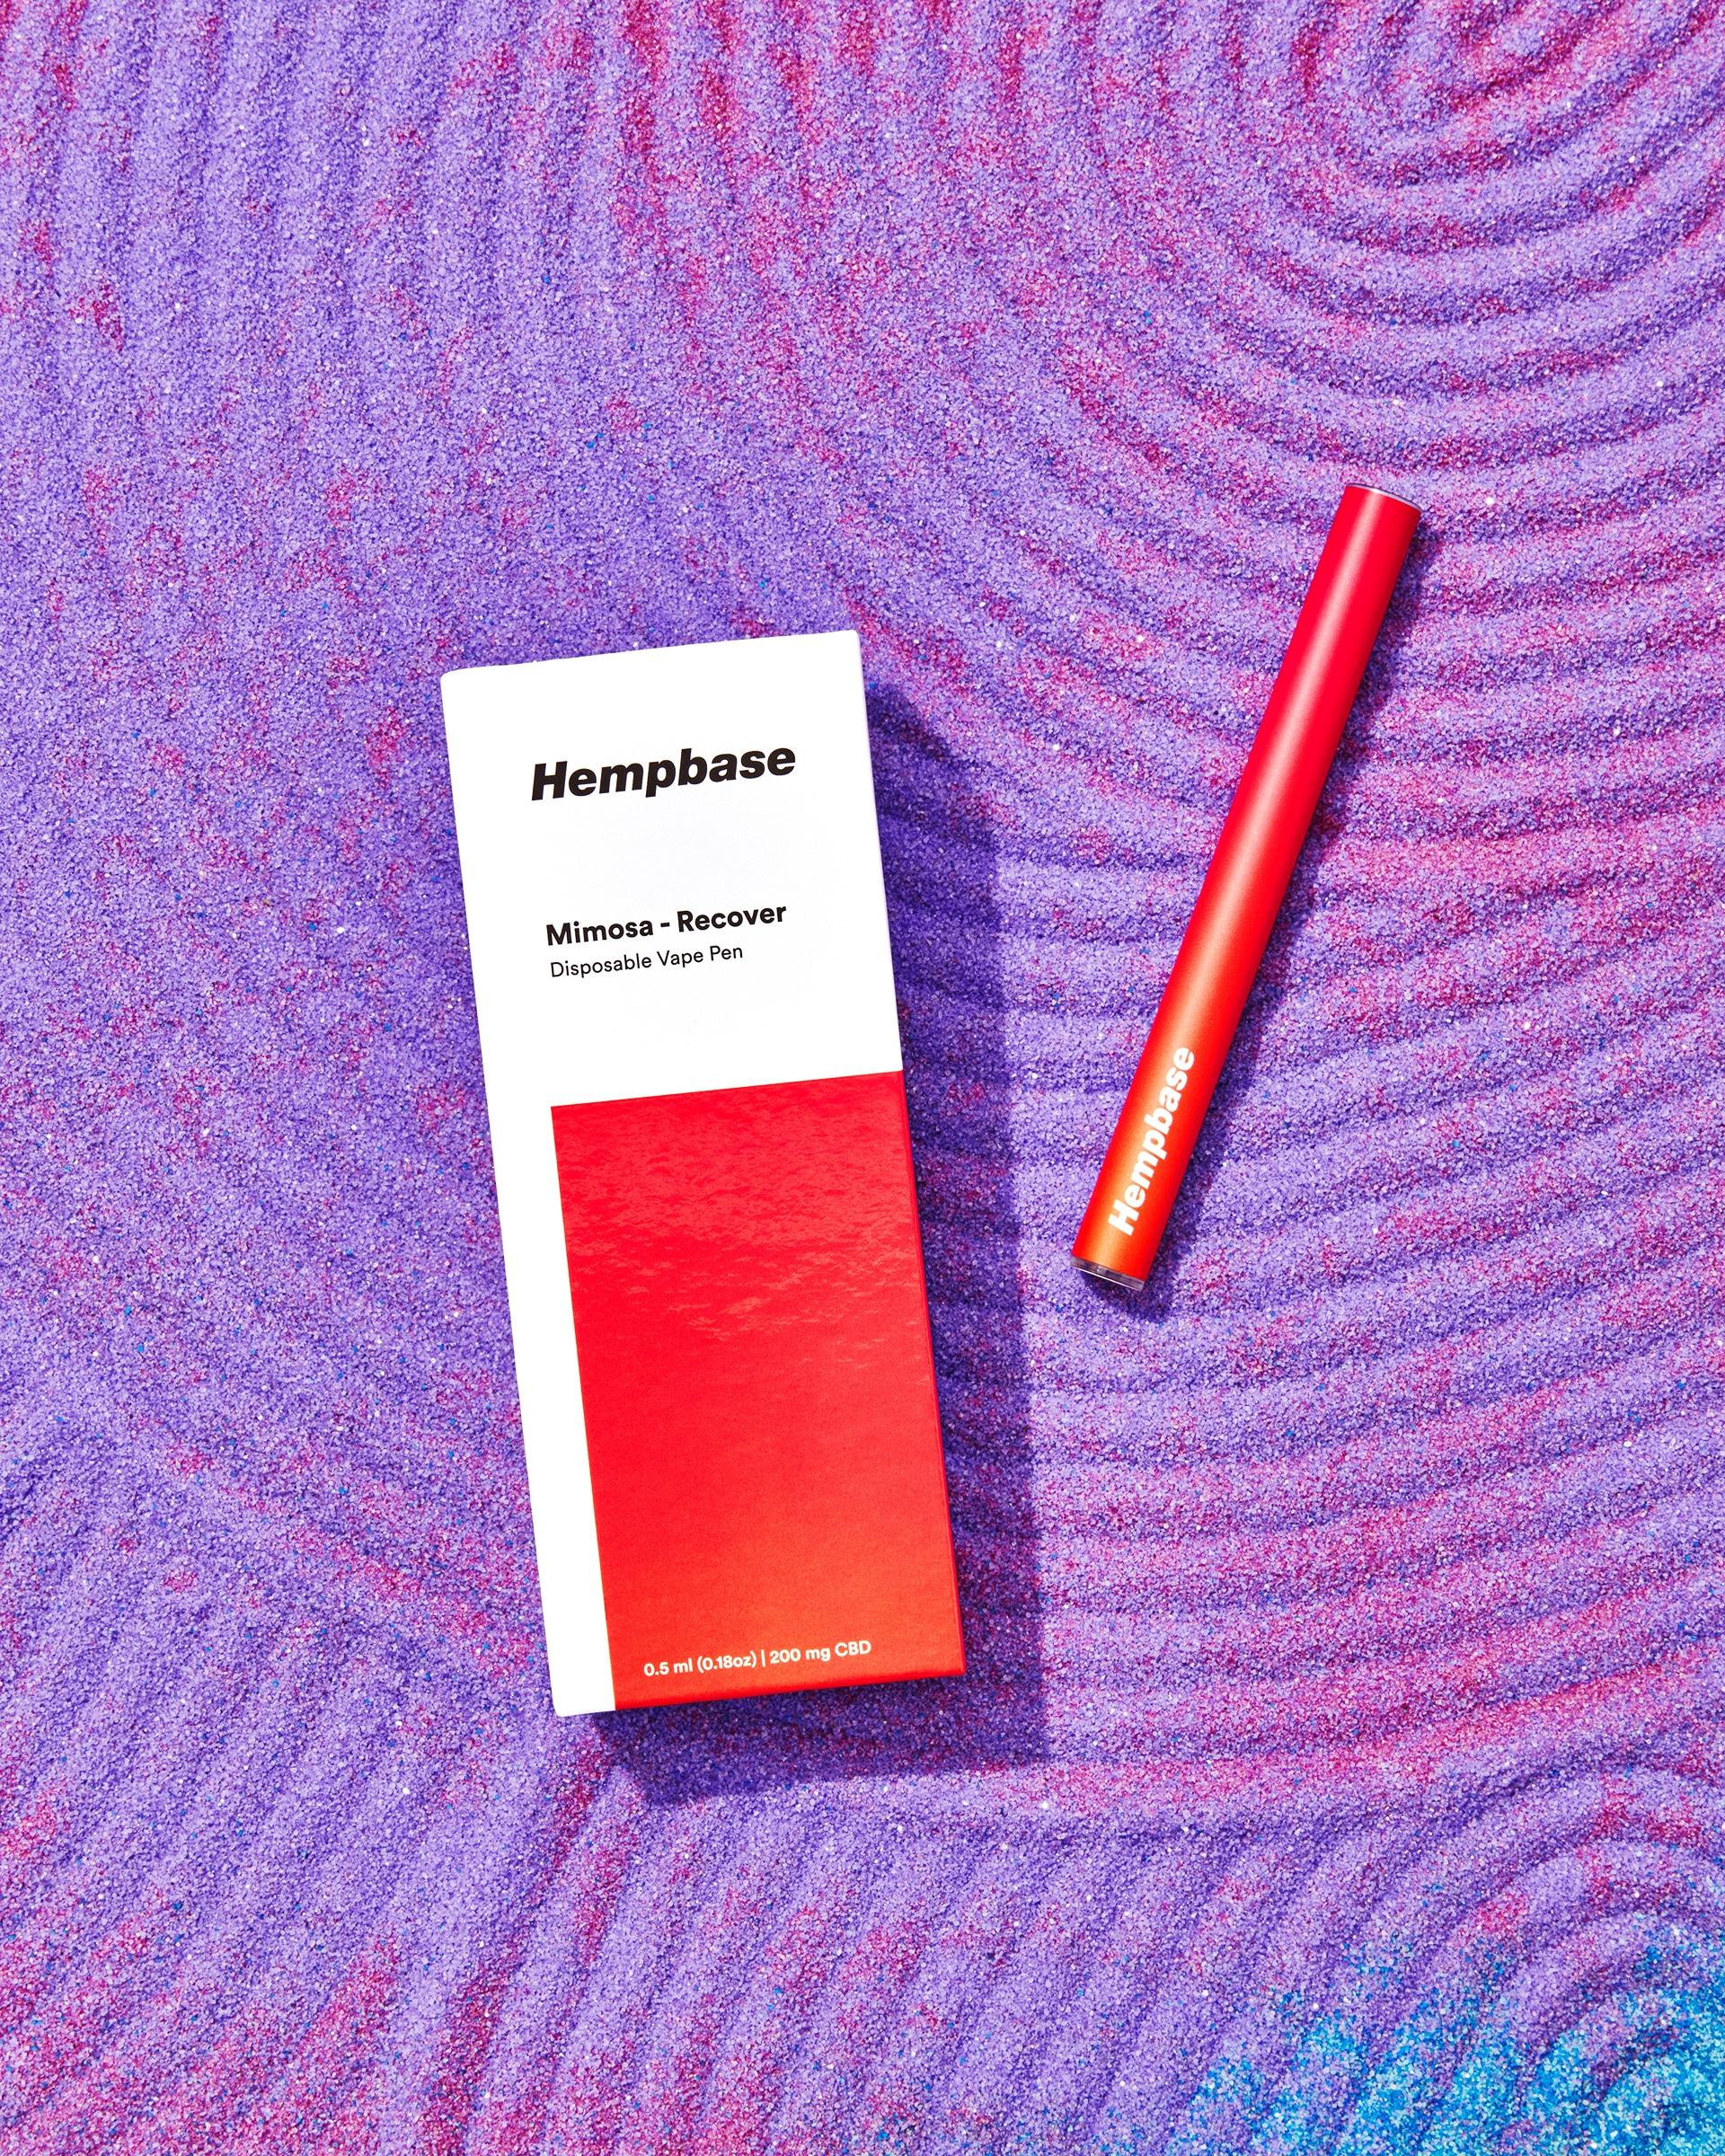 Mimosa-Recover Disposable Pen - 200mg CBD - Hempbase